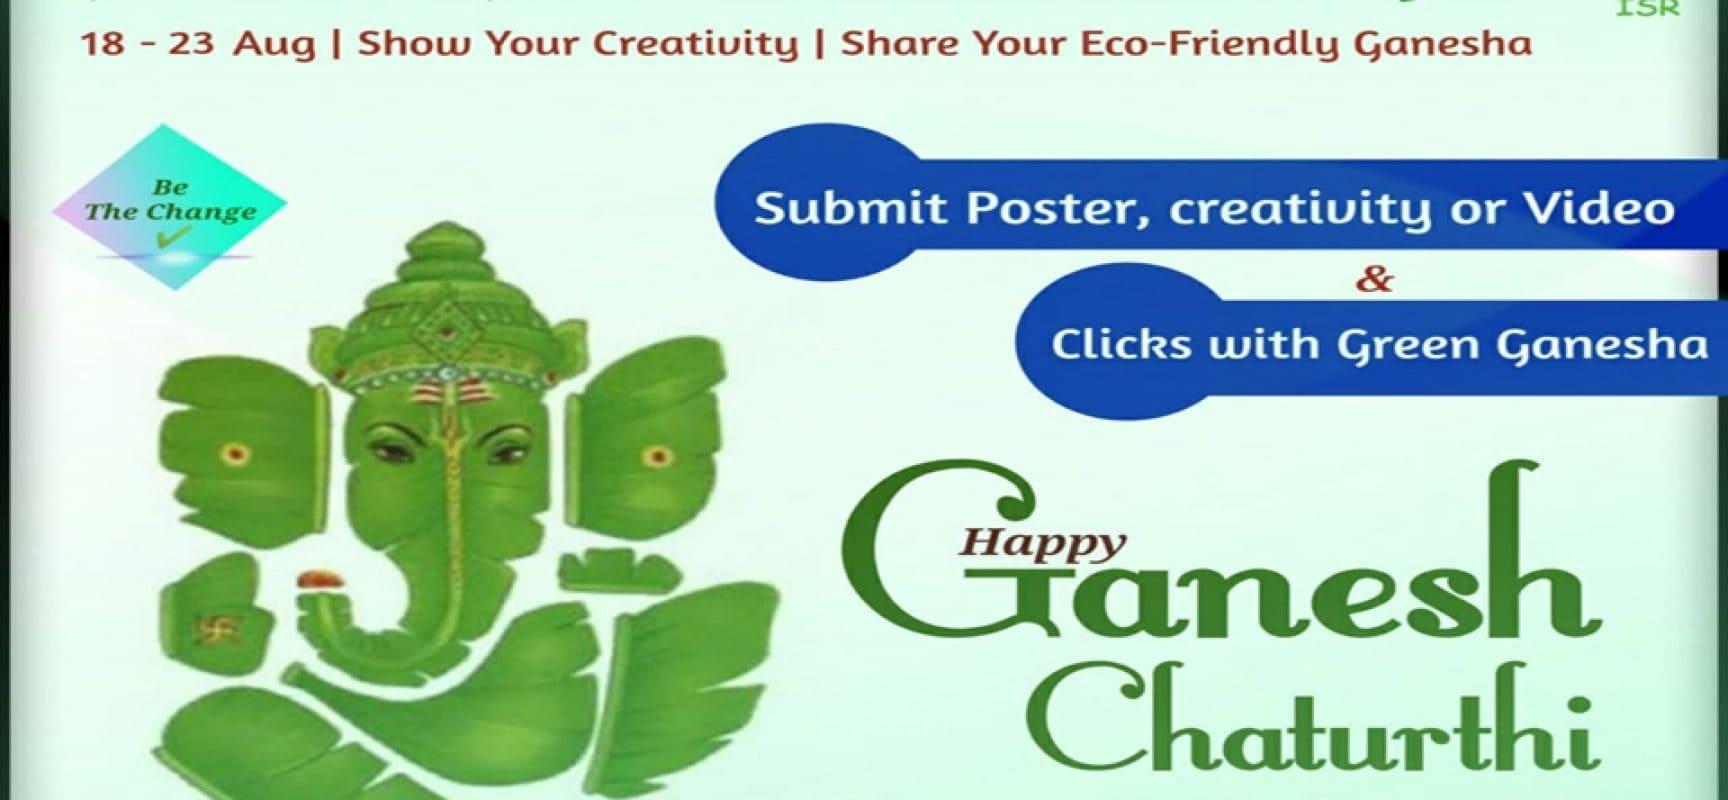 The Green Ganesha Challenge